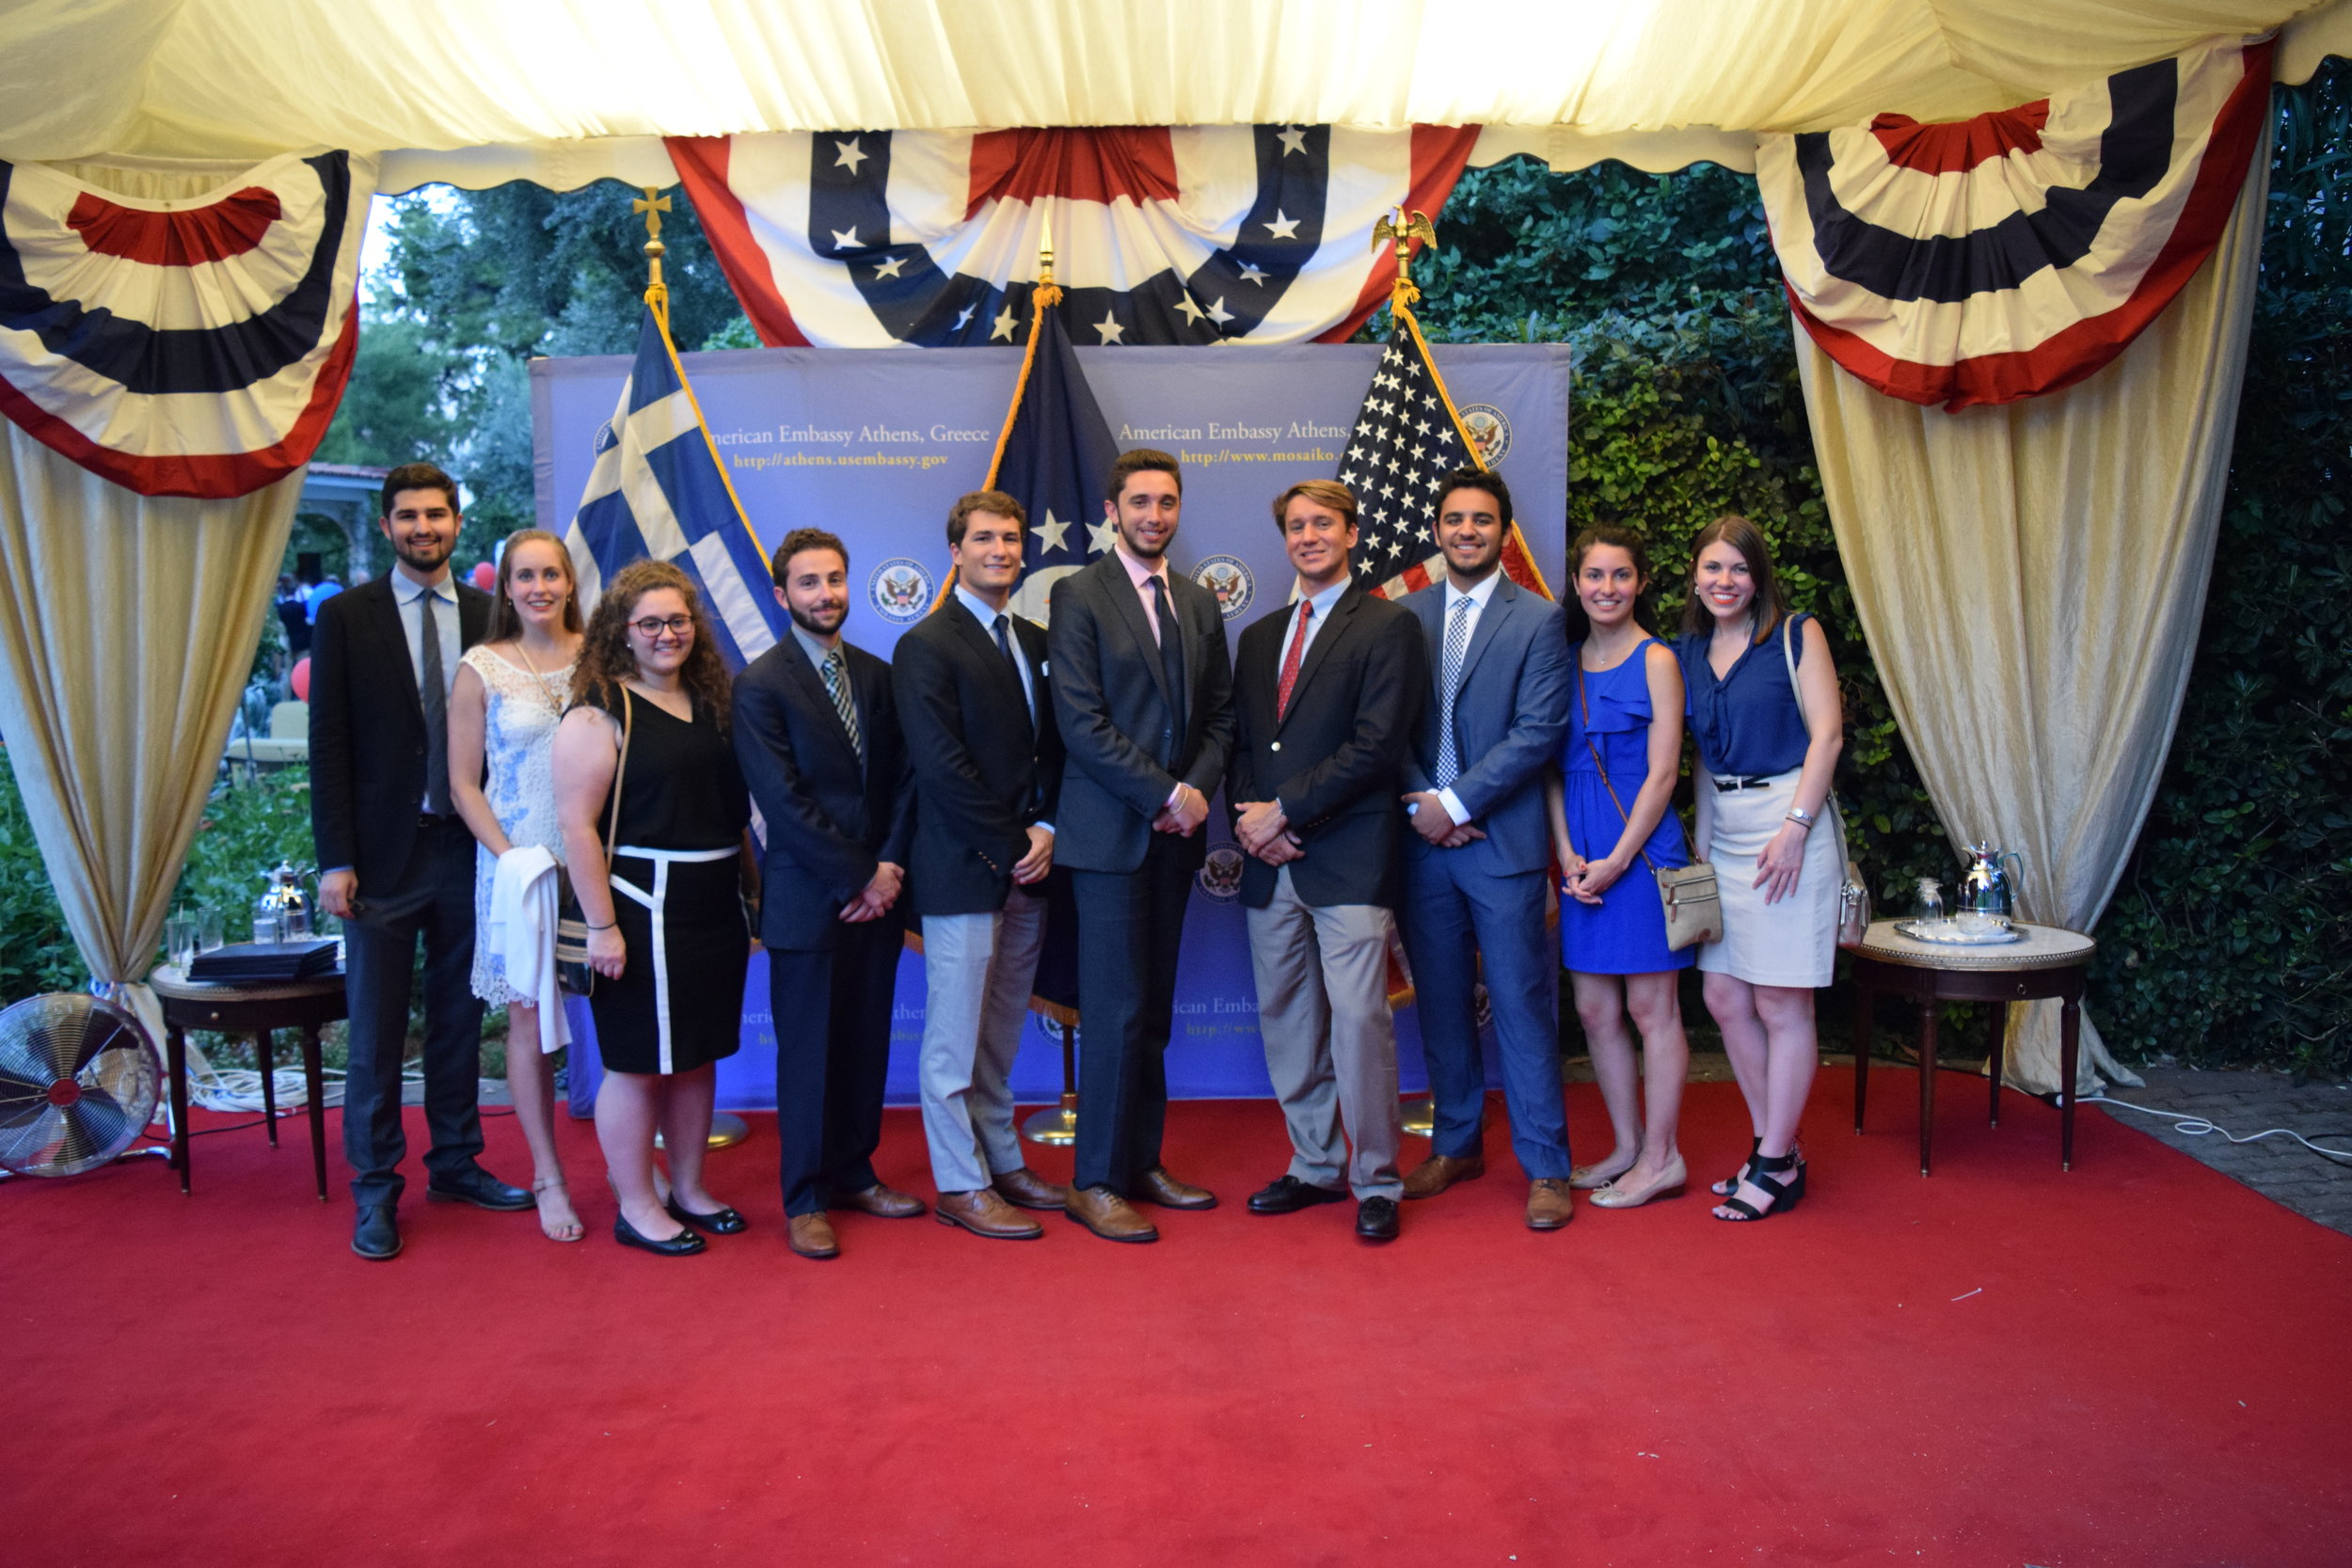 July 4th Embassy Reception at the Ambassador's Residence.